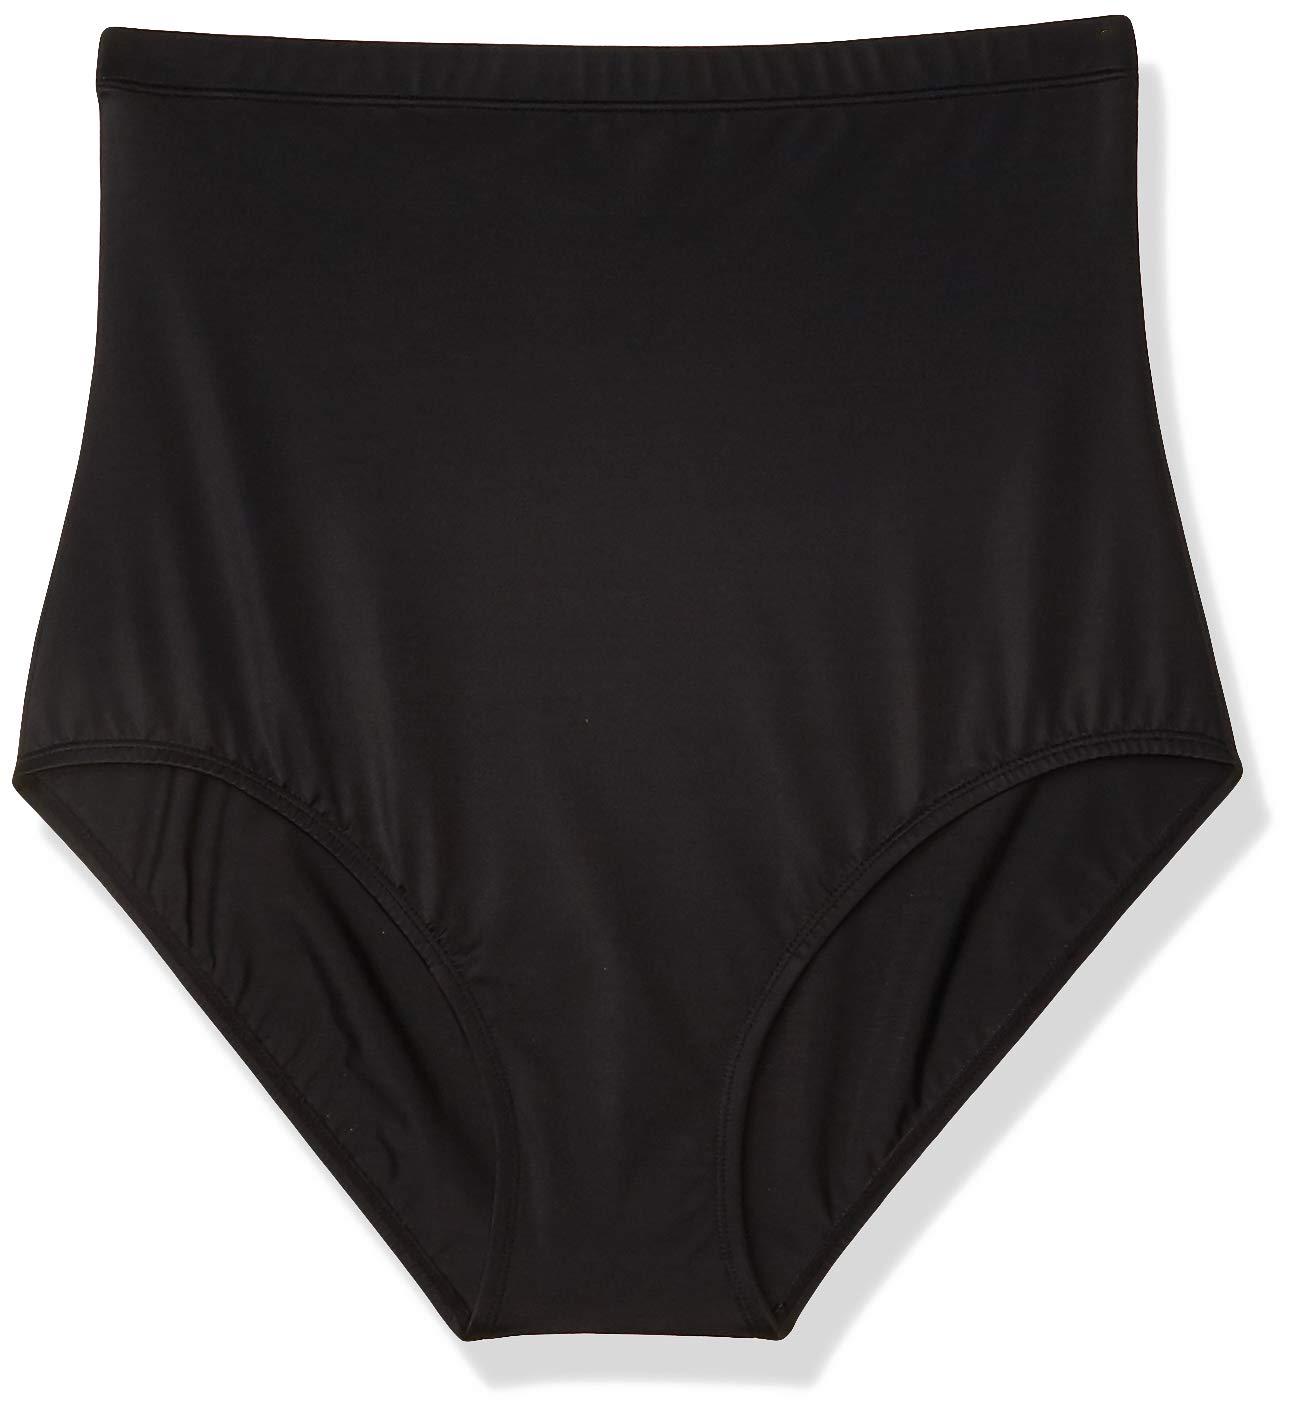 Amazon Brand - Coastal Blue Women's Control Swimwear Bikini Bottom